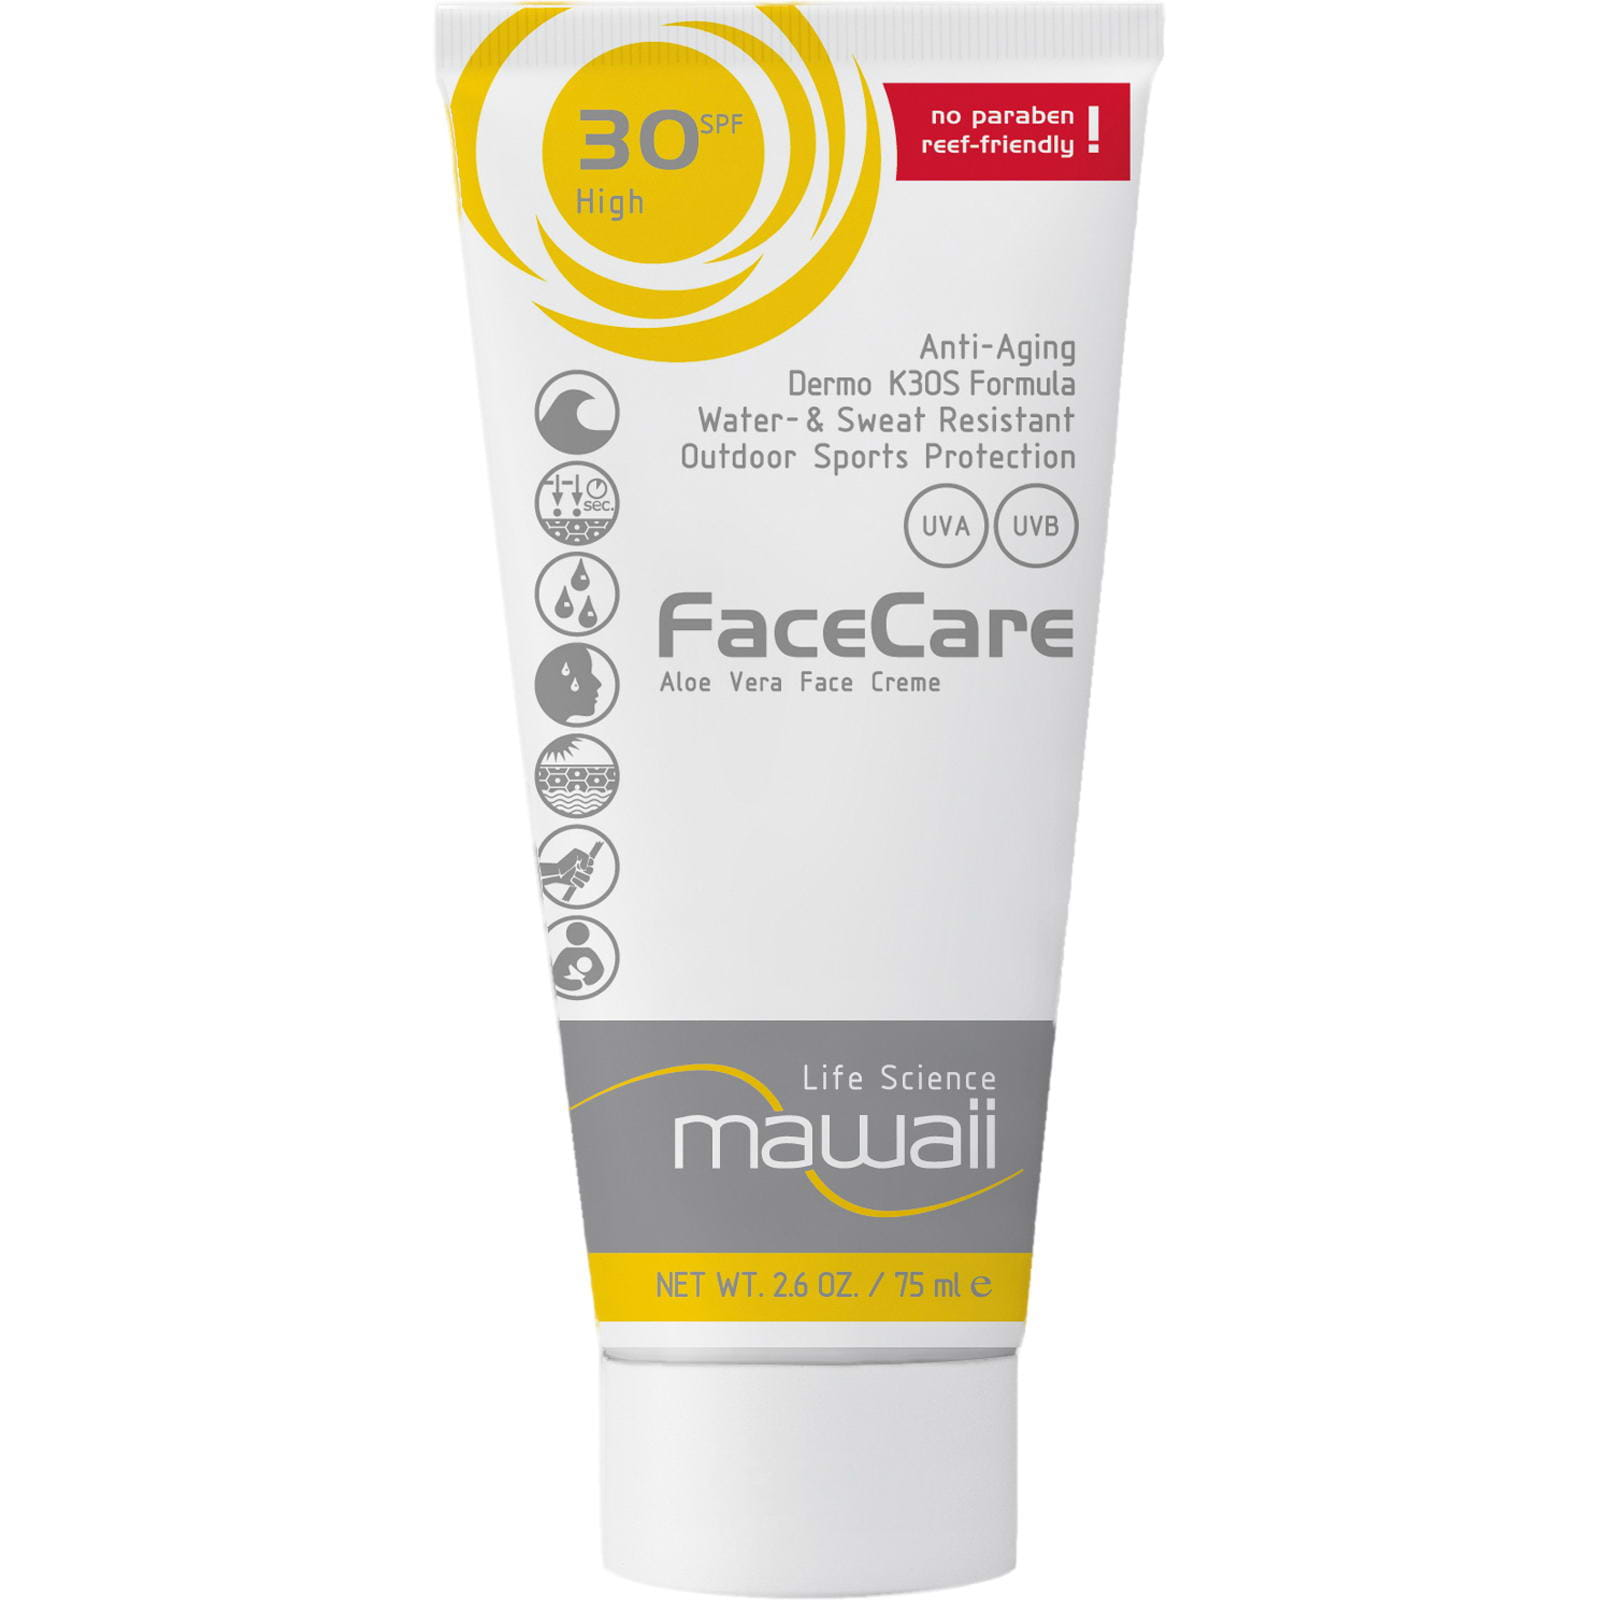 mawaii FaceCare SPF 30 - 75 ml - Bild 1